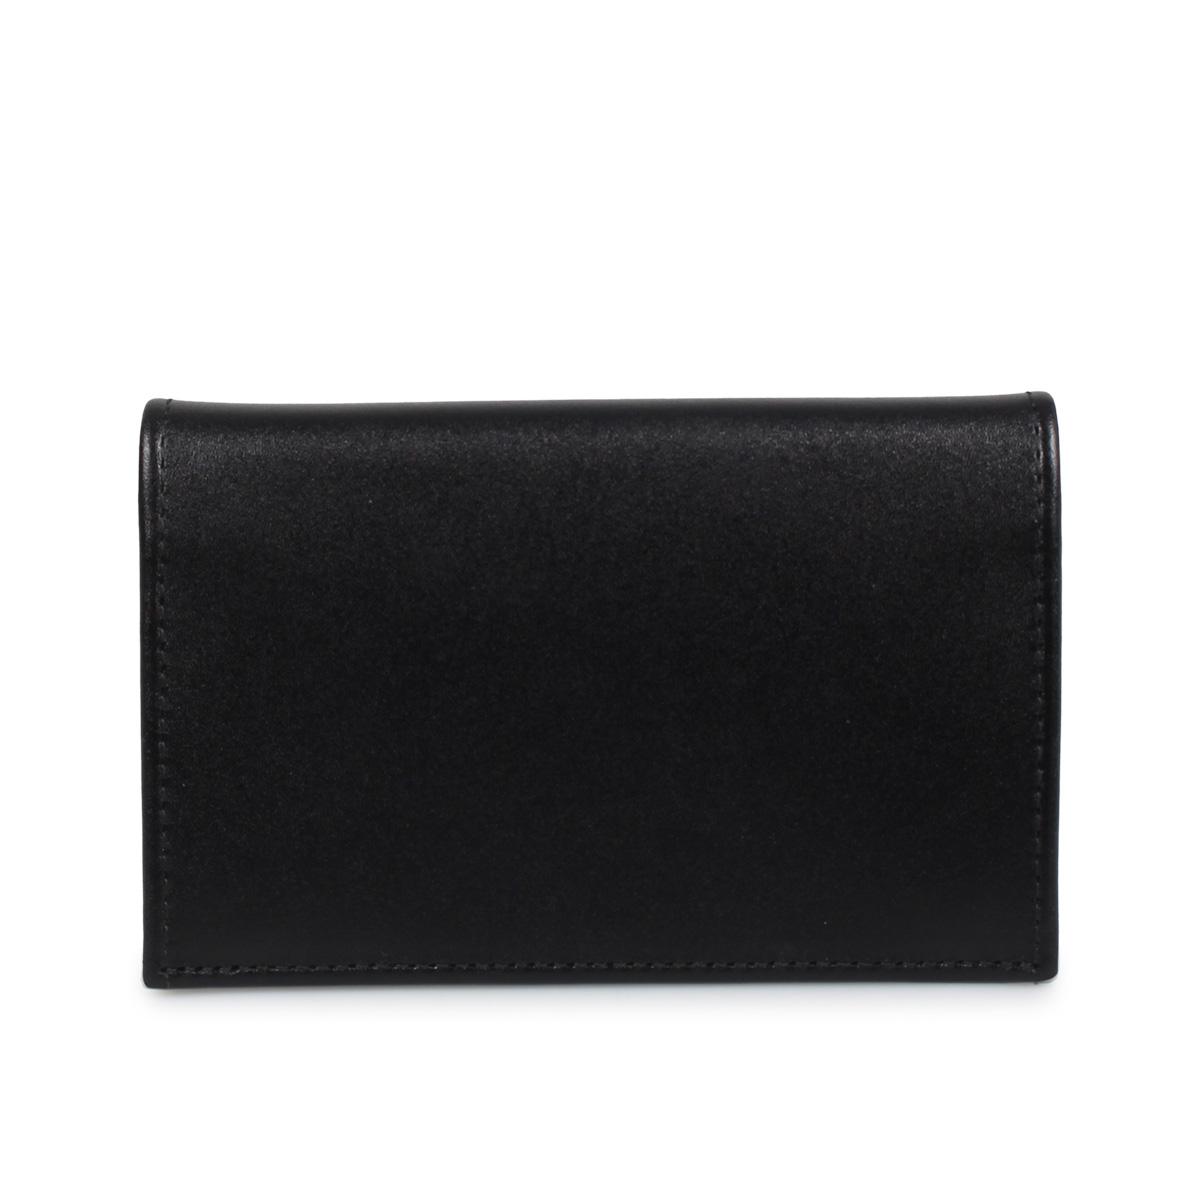 ETTINGER VISITING CARD CASE エッティンガー カードケース 名刺入れ 定期入れ メンズ 本革 ブラック 黒 ST143JR